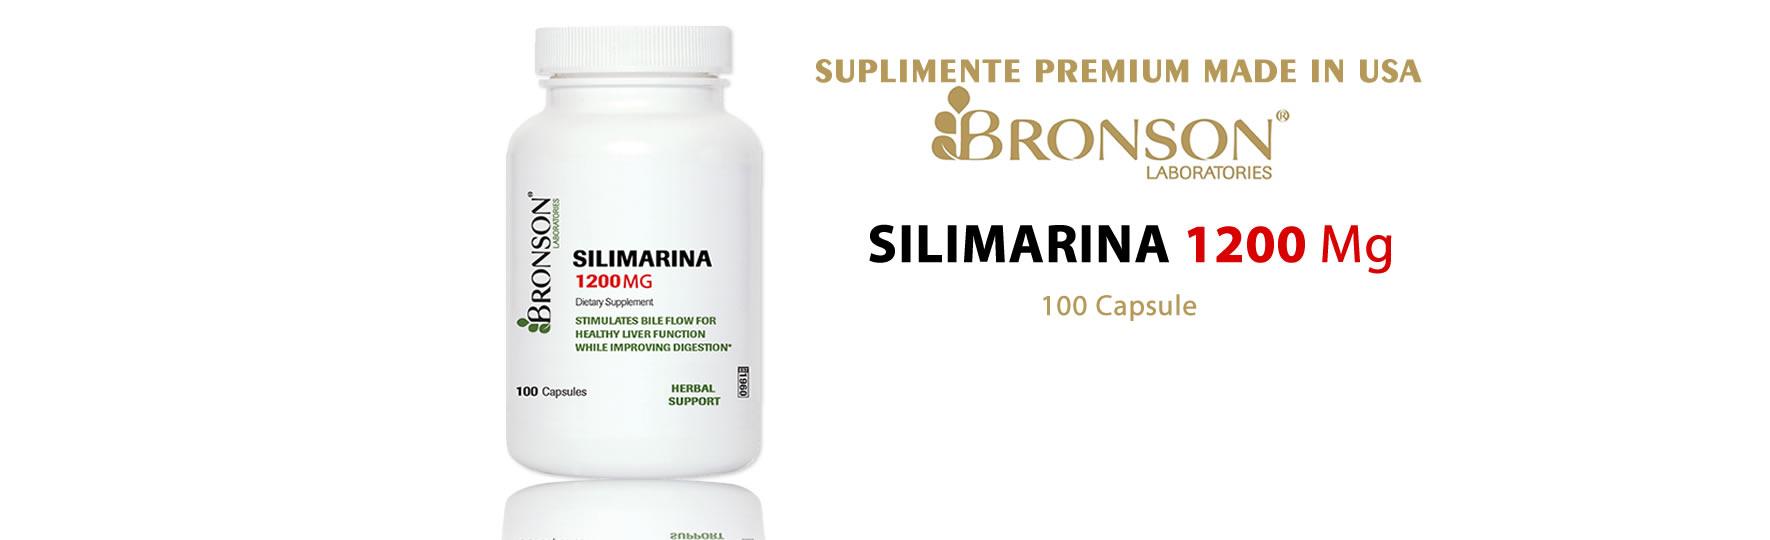 Silimarina-Bronson